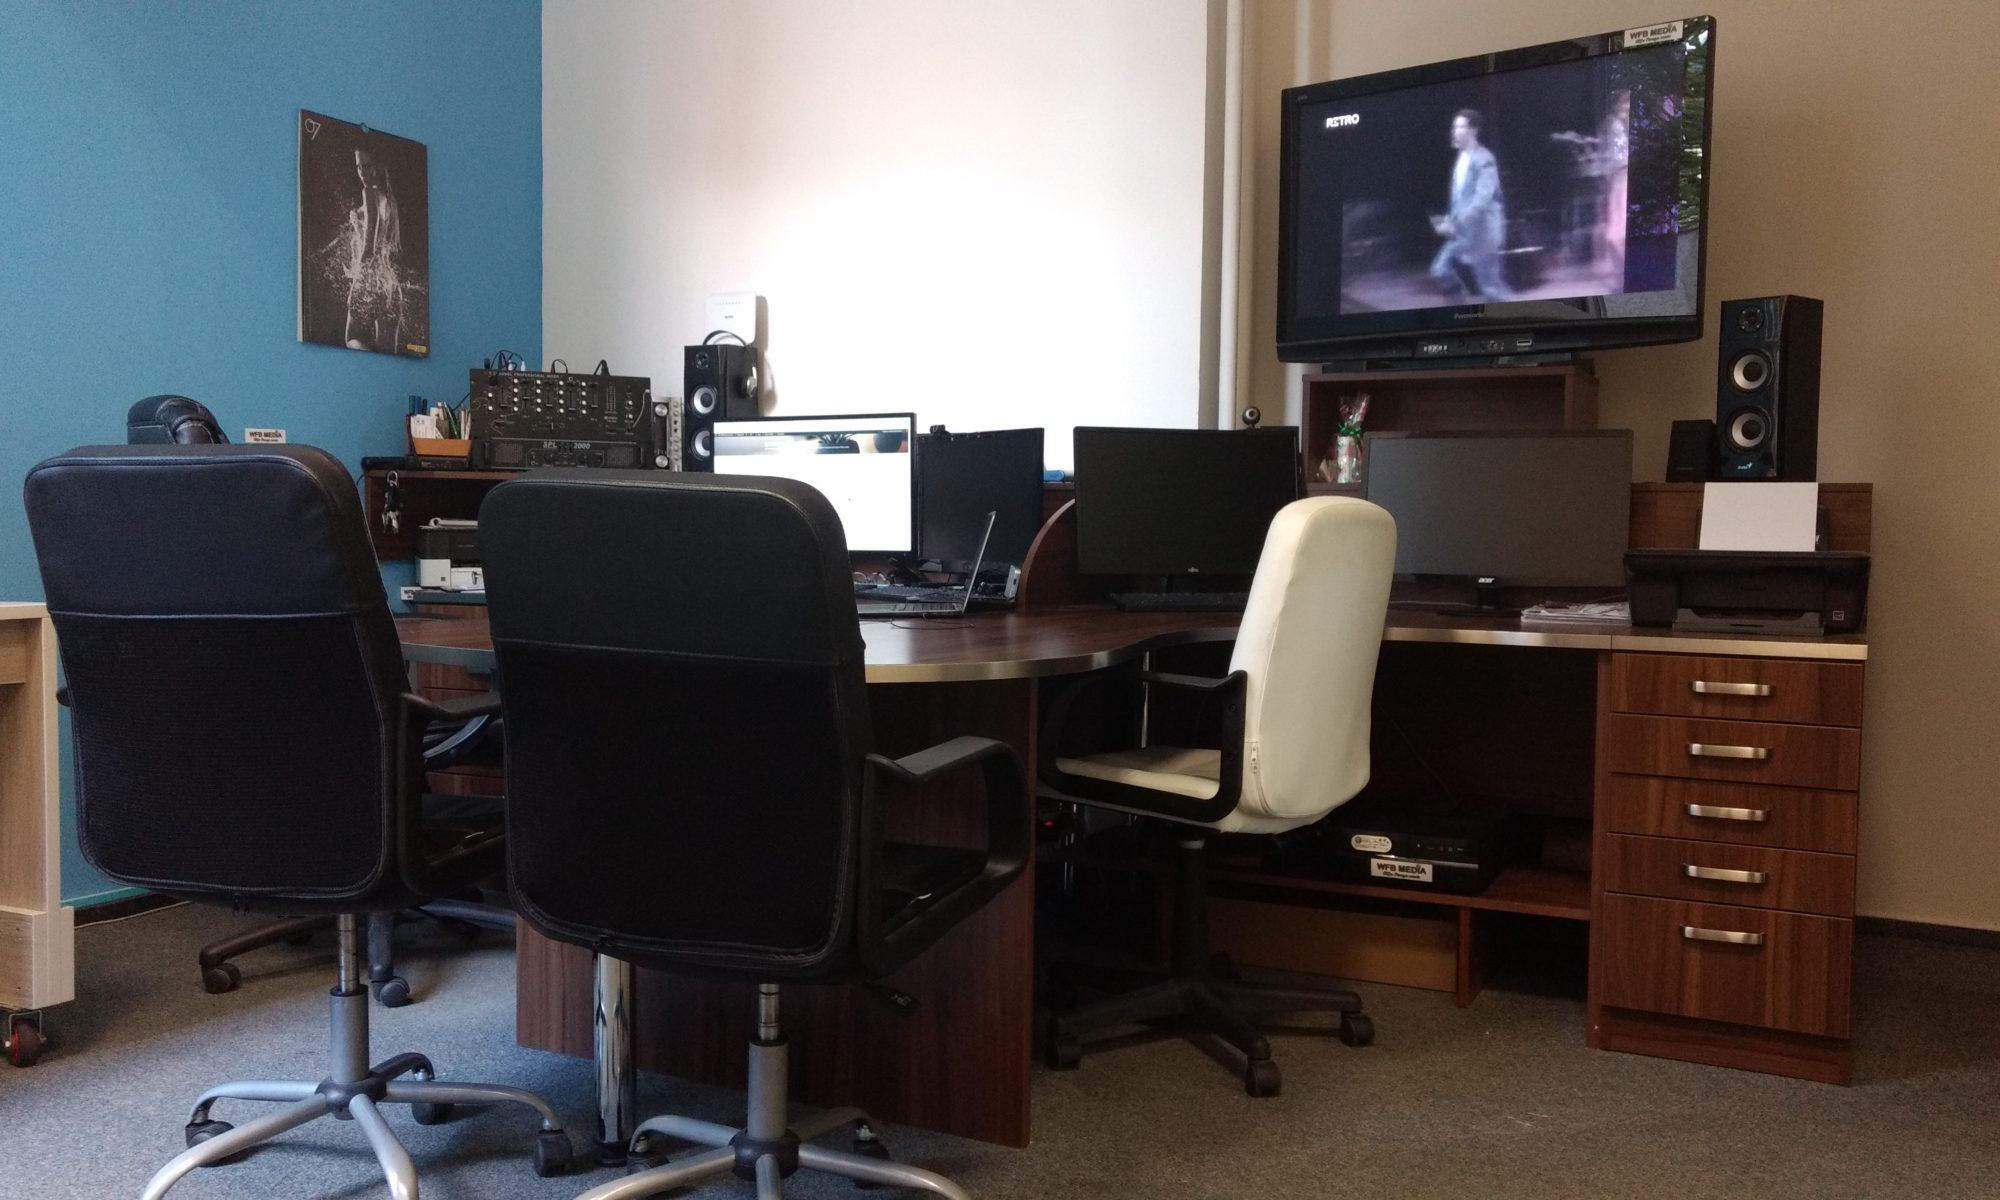 Kancelář studia: WEB – FOTO – MEDIA – SEO – VIDEO - REKLAMA - MARKETING-INFO PLZEŇ